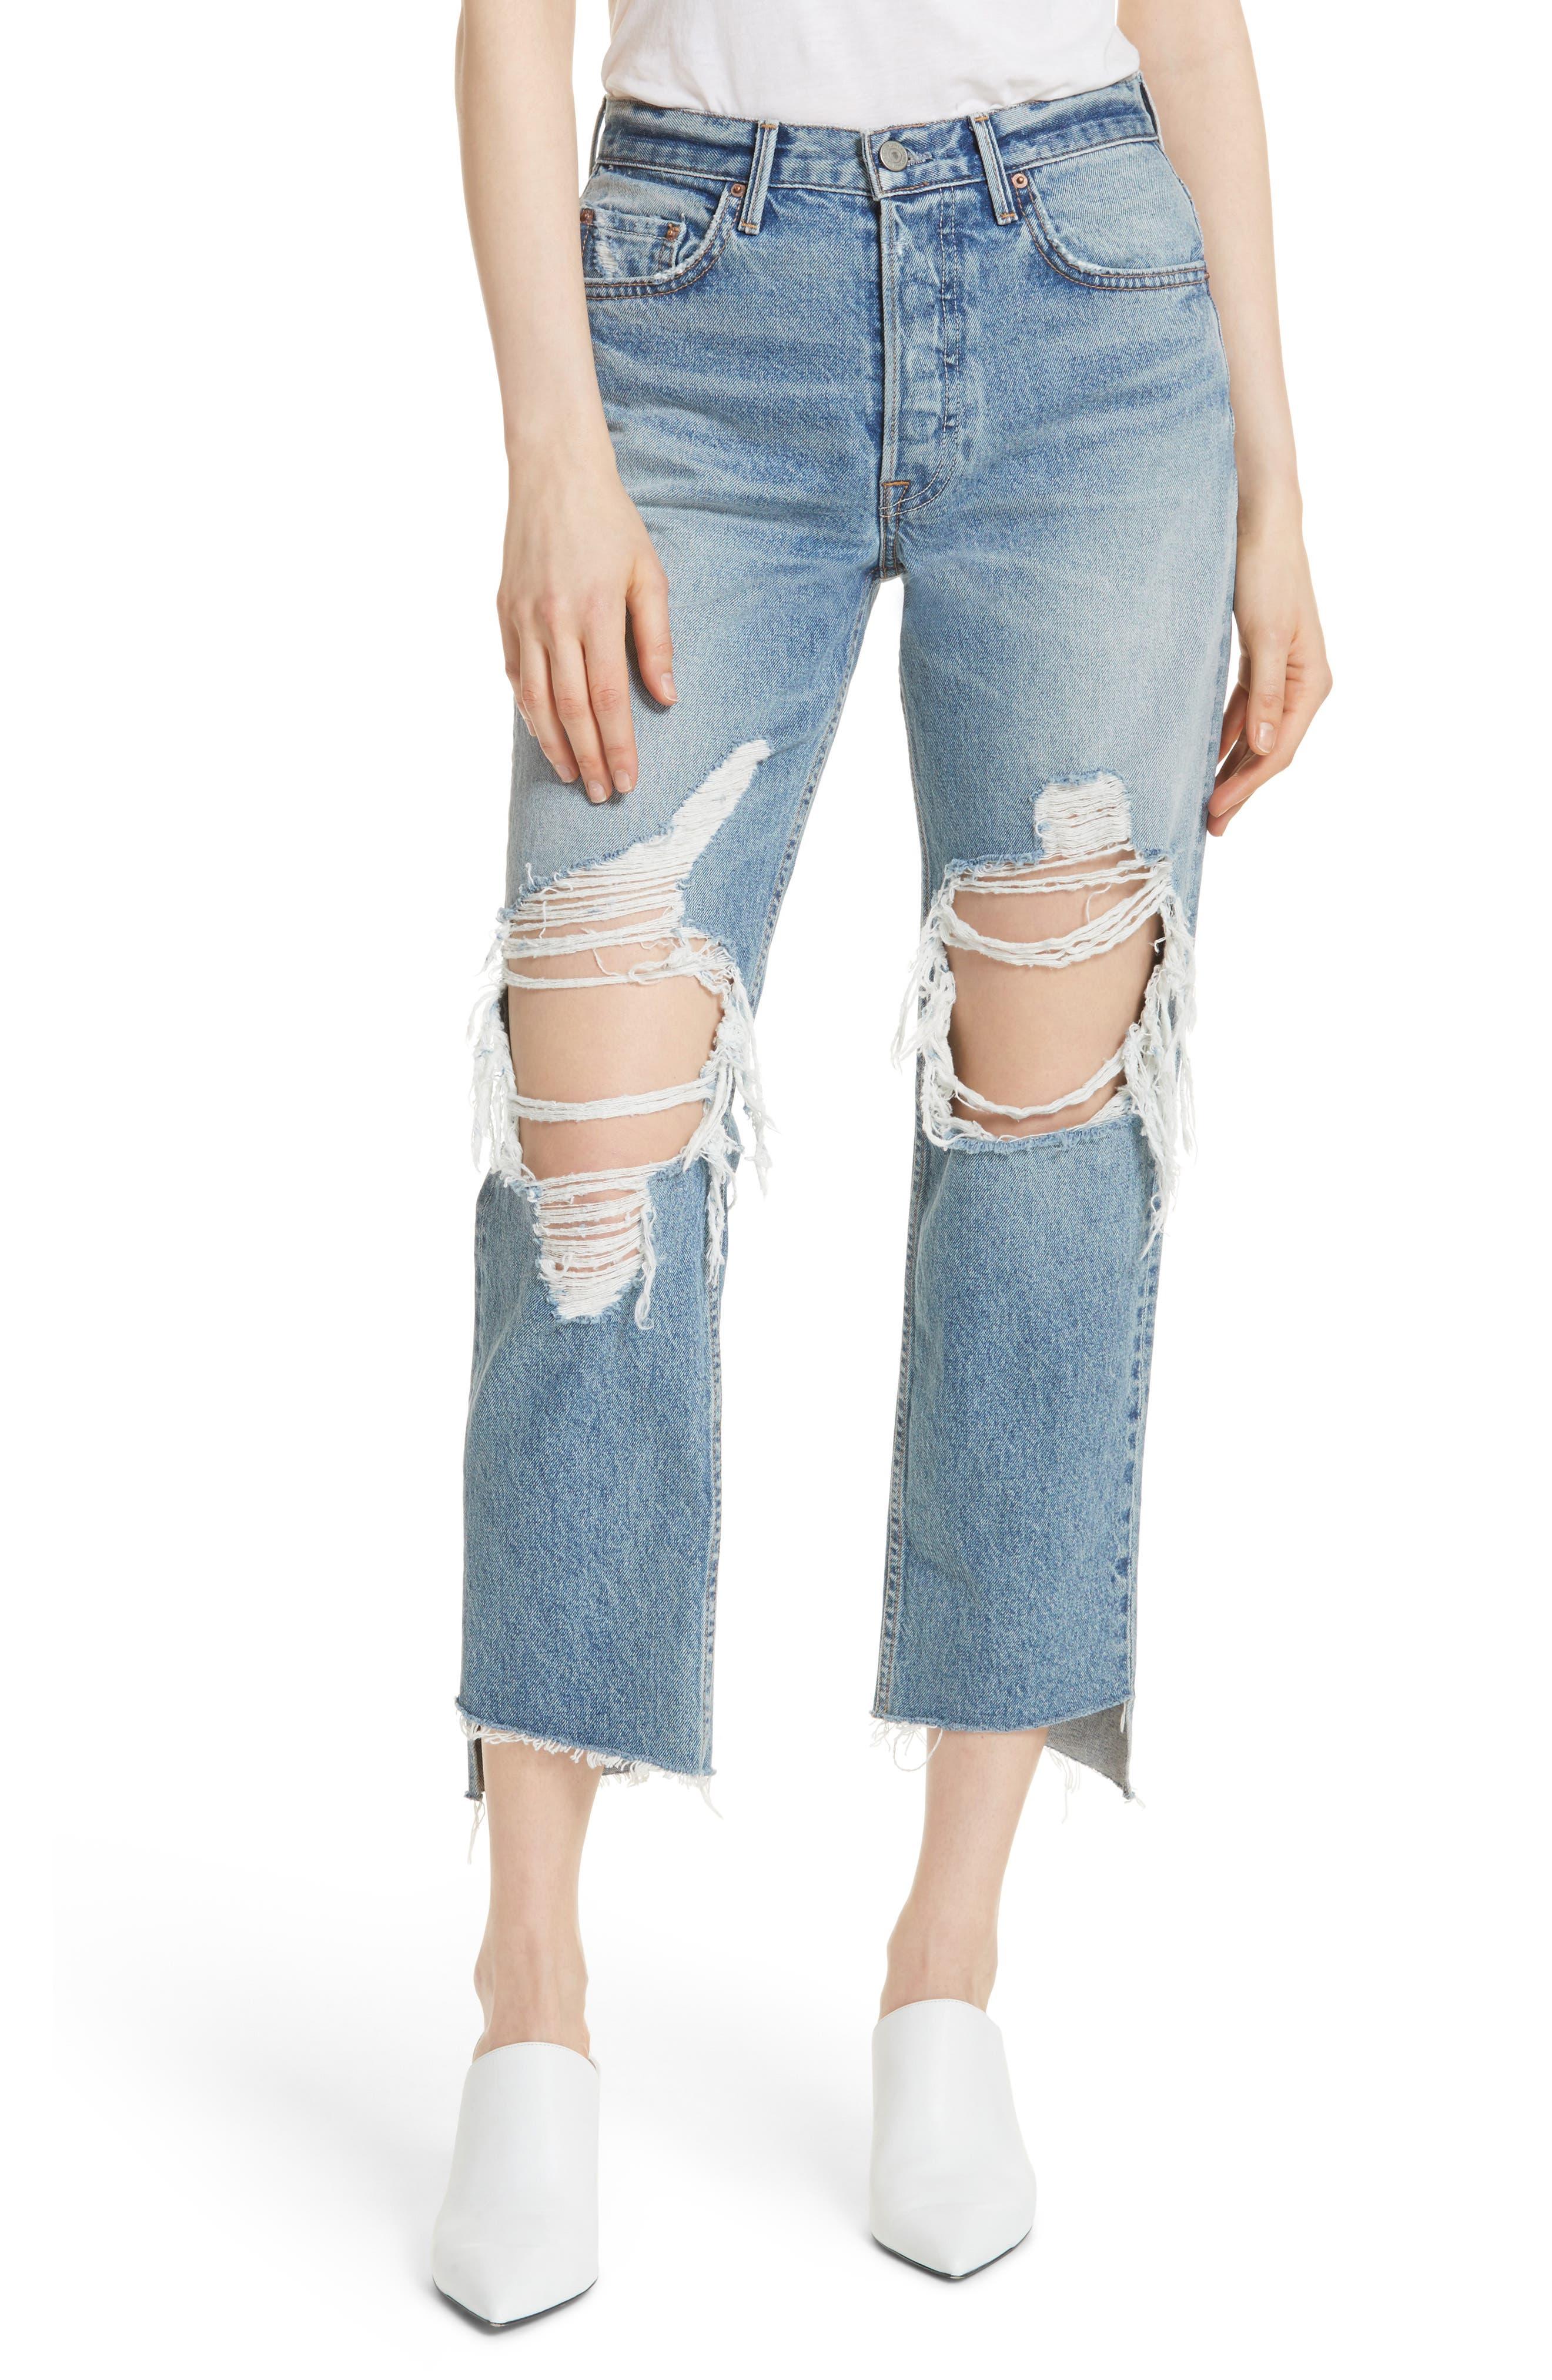 Helena Ripped Rigid High Waist Straight Jeans,                             Main thumbnail 1, color,                             487